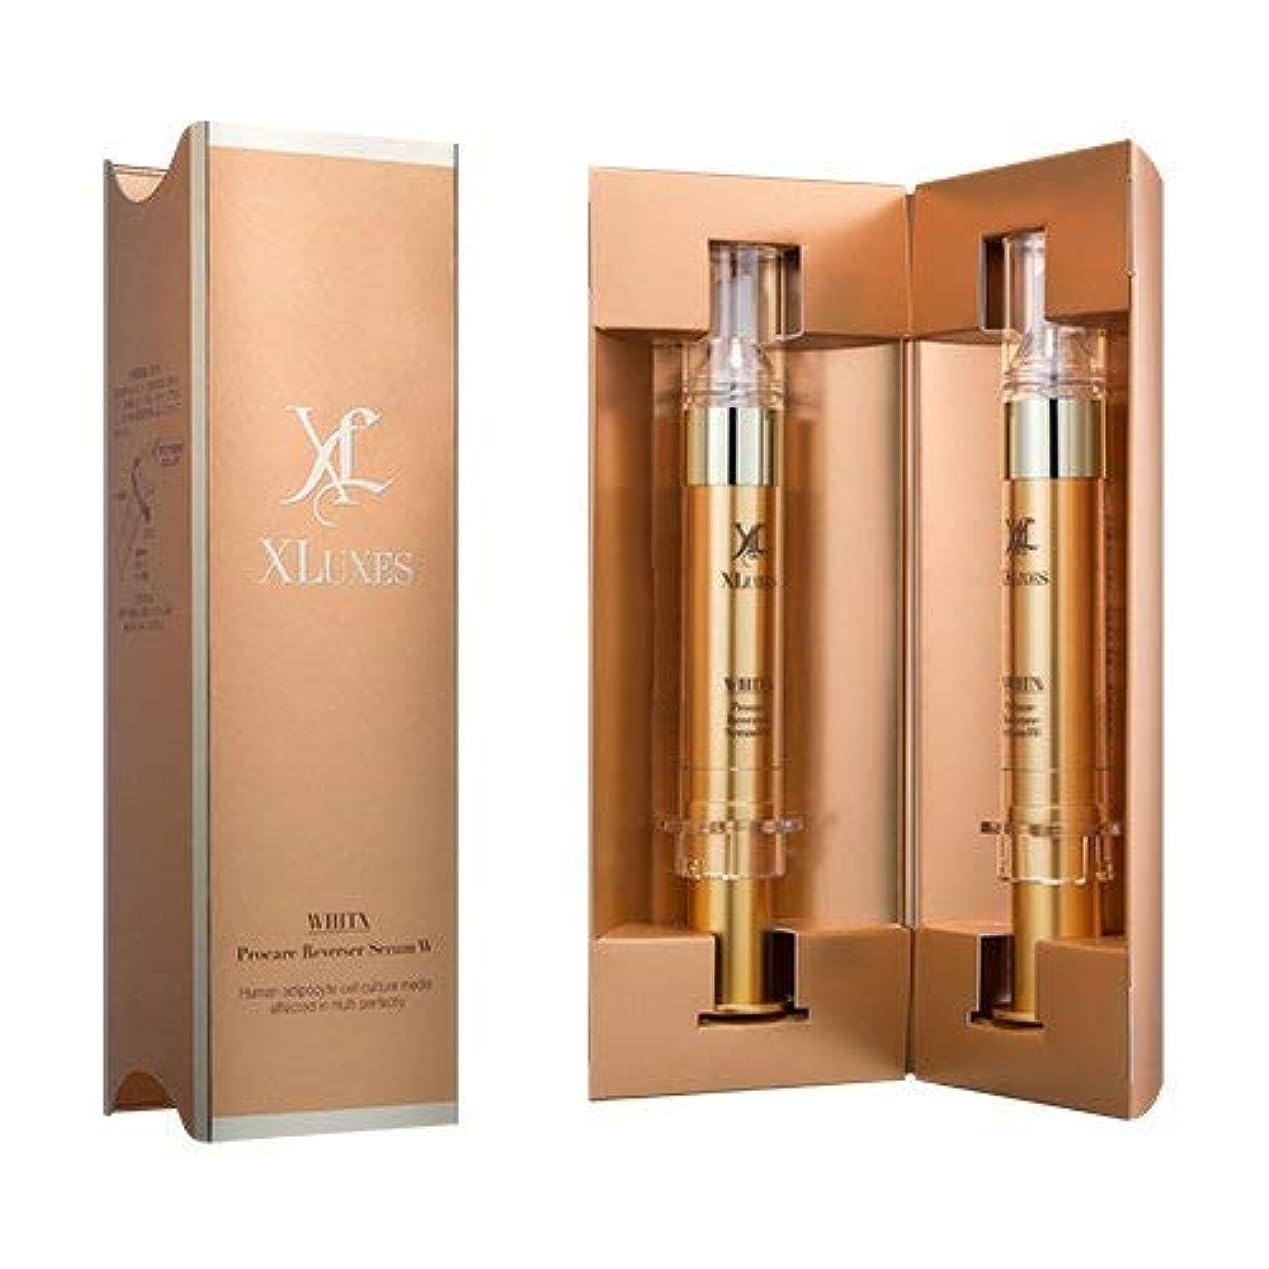 XLUXES 美容液 [ヒト幹細胞 培養液配合] プロケア リバーサーセラムW (20mL×2本入)